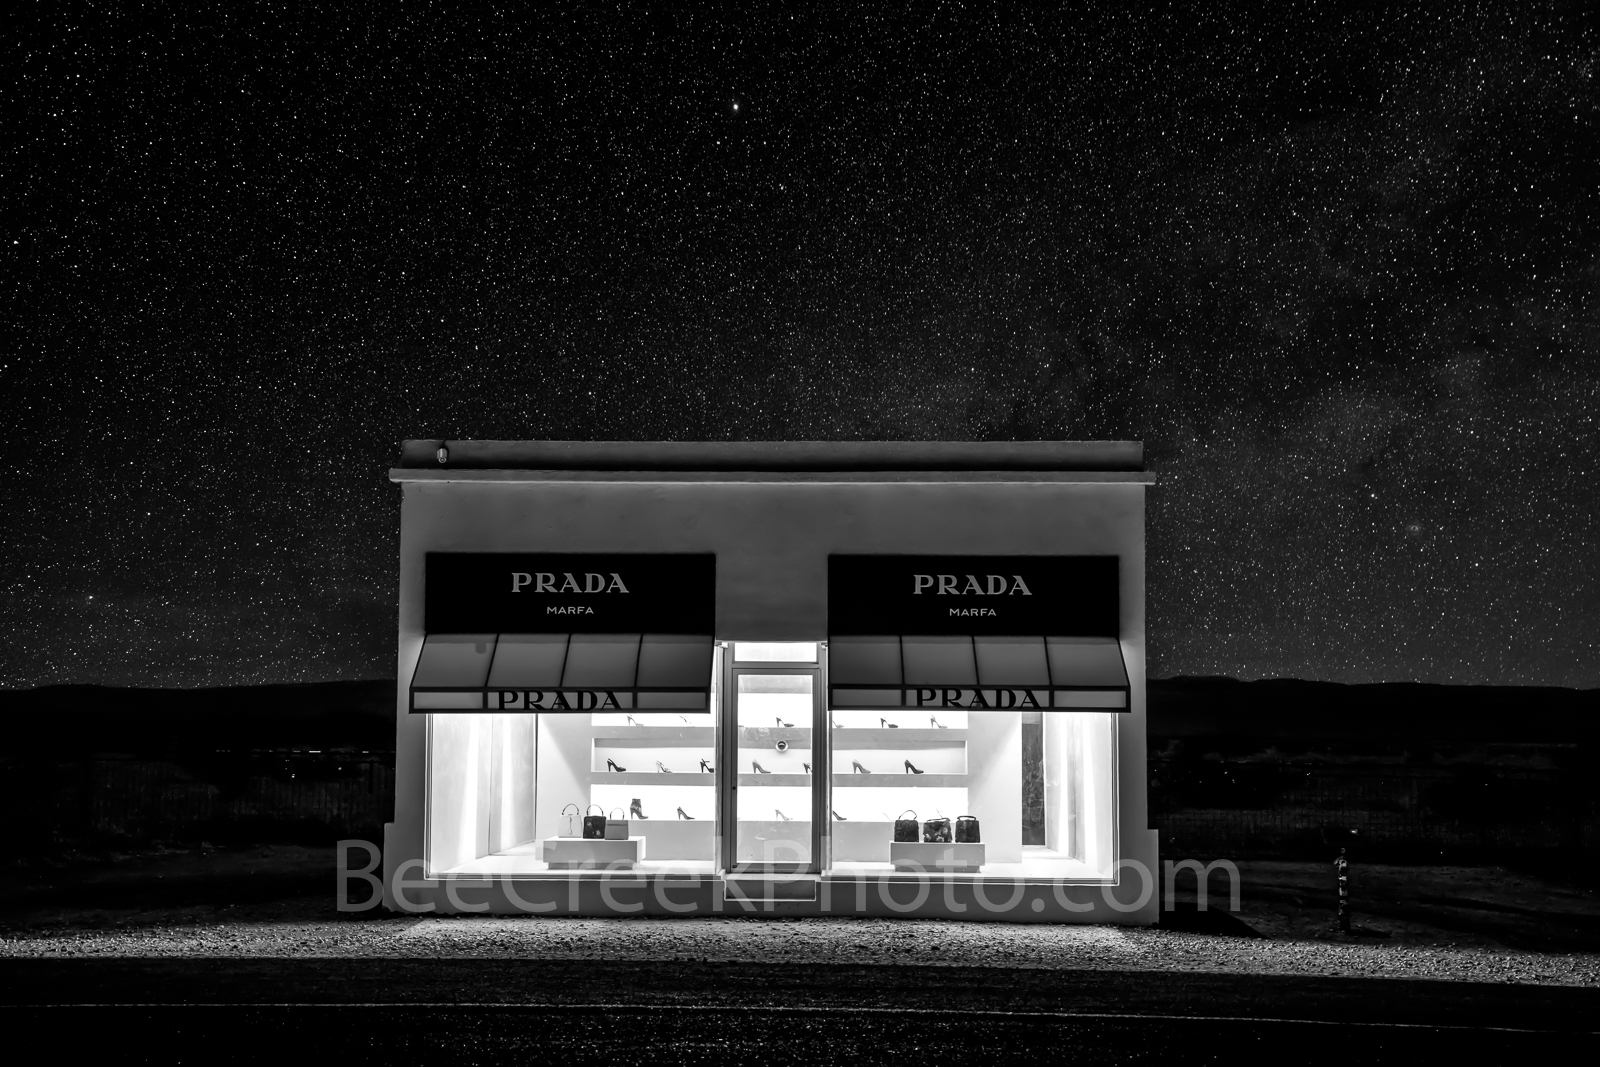 Prada Marfa, stars, black and white,BW, night, dark, Marfa lights, west texas, starry, night skies, pop art, artist, Elmgreen and Dragset, pop architectural land art, shoes, purses, store front, west , photo